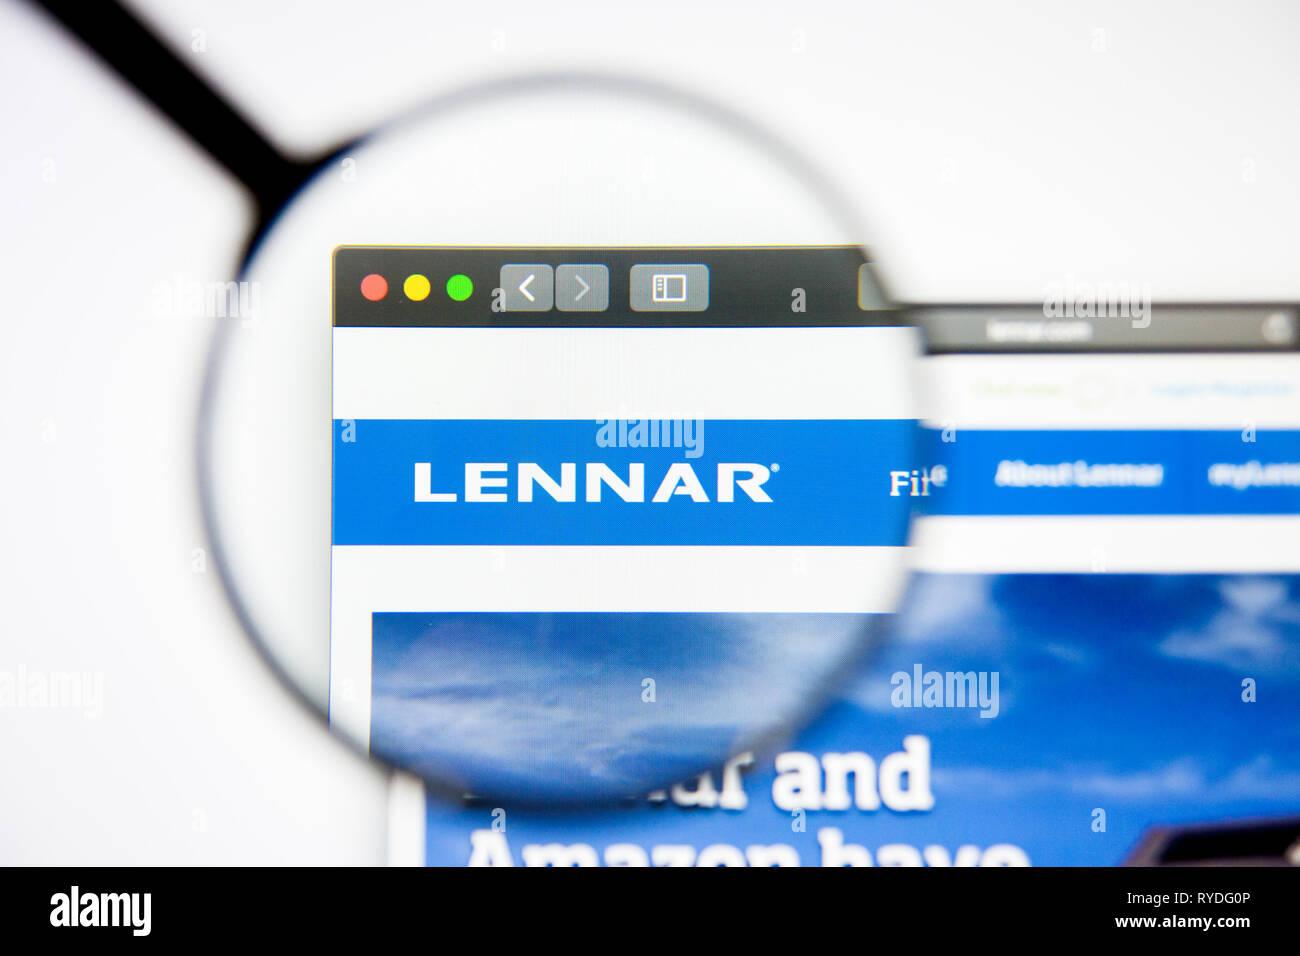 Los Angeles, California, USA - 5 March 2019: Lennar website homepage. Lennar logo visible on display screen, Illustrative Editorial - Stock Image